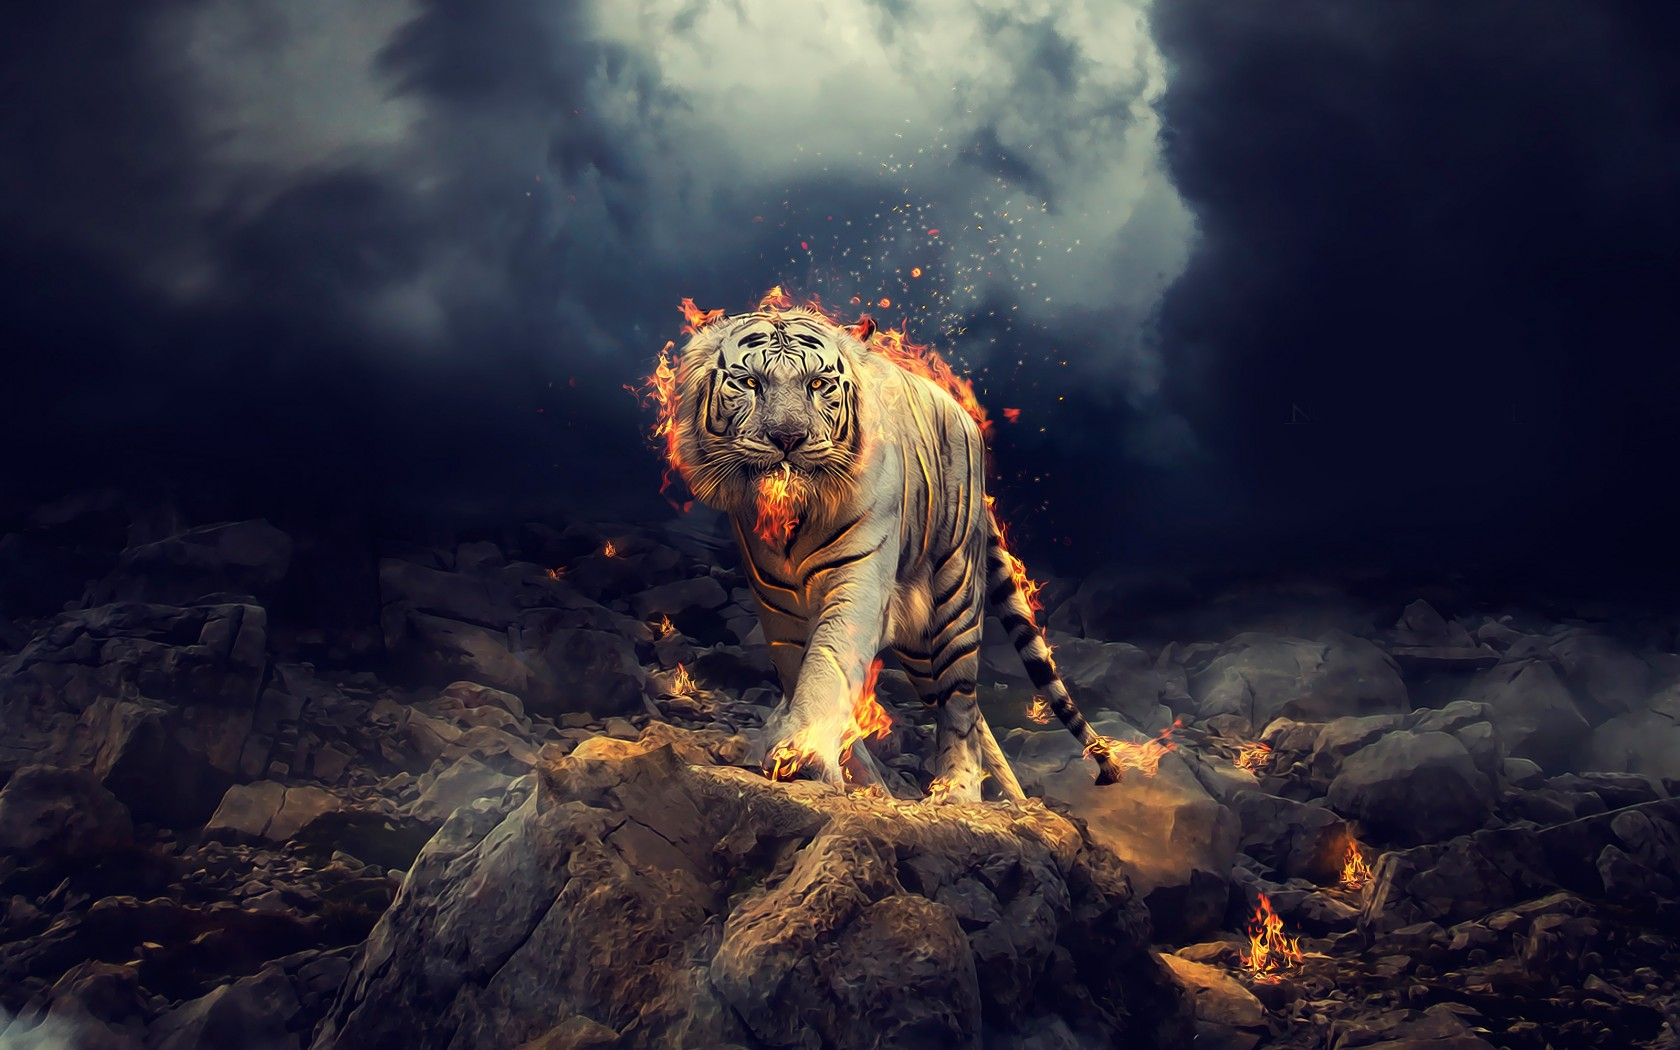 white tiger 1680x1050 fire 4k animal, 4k images, 4k white tiger, hd